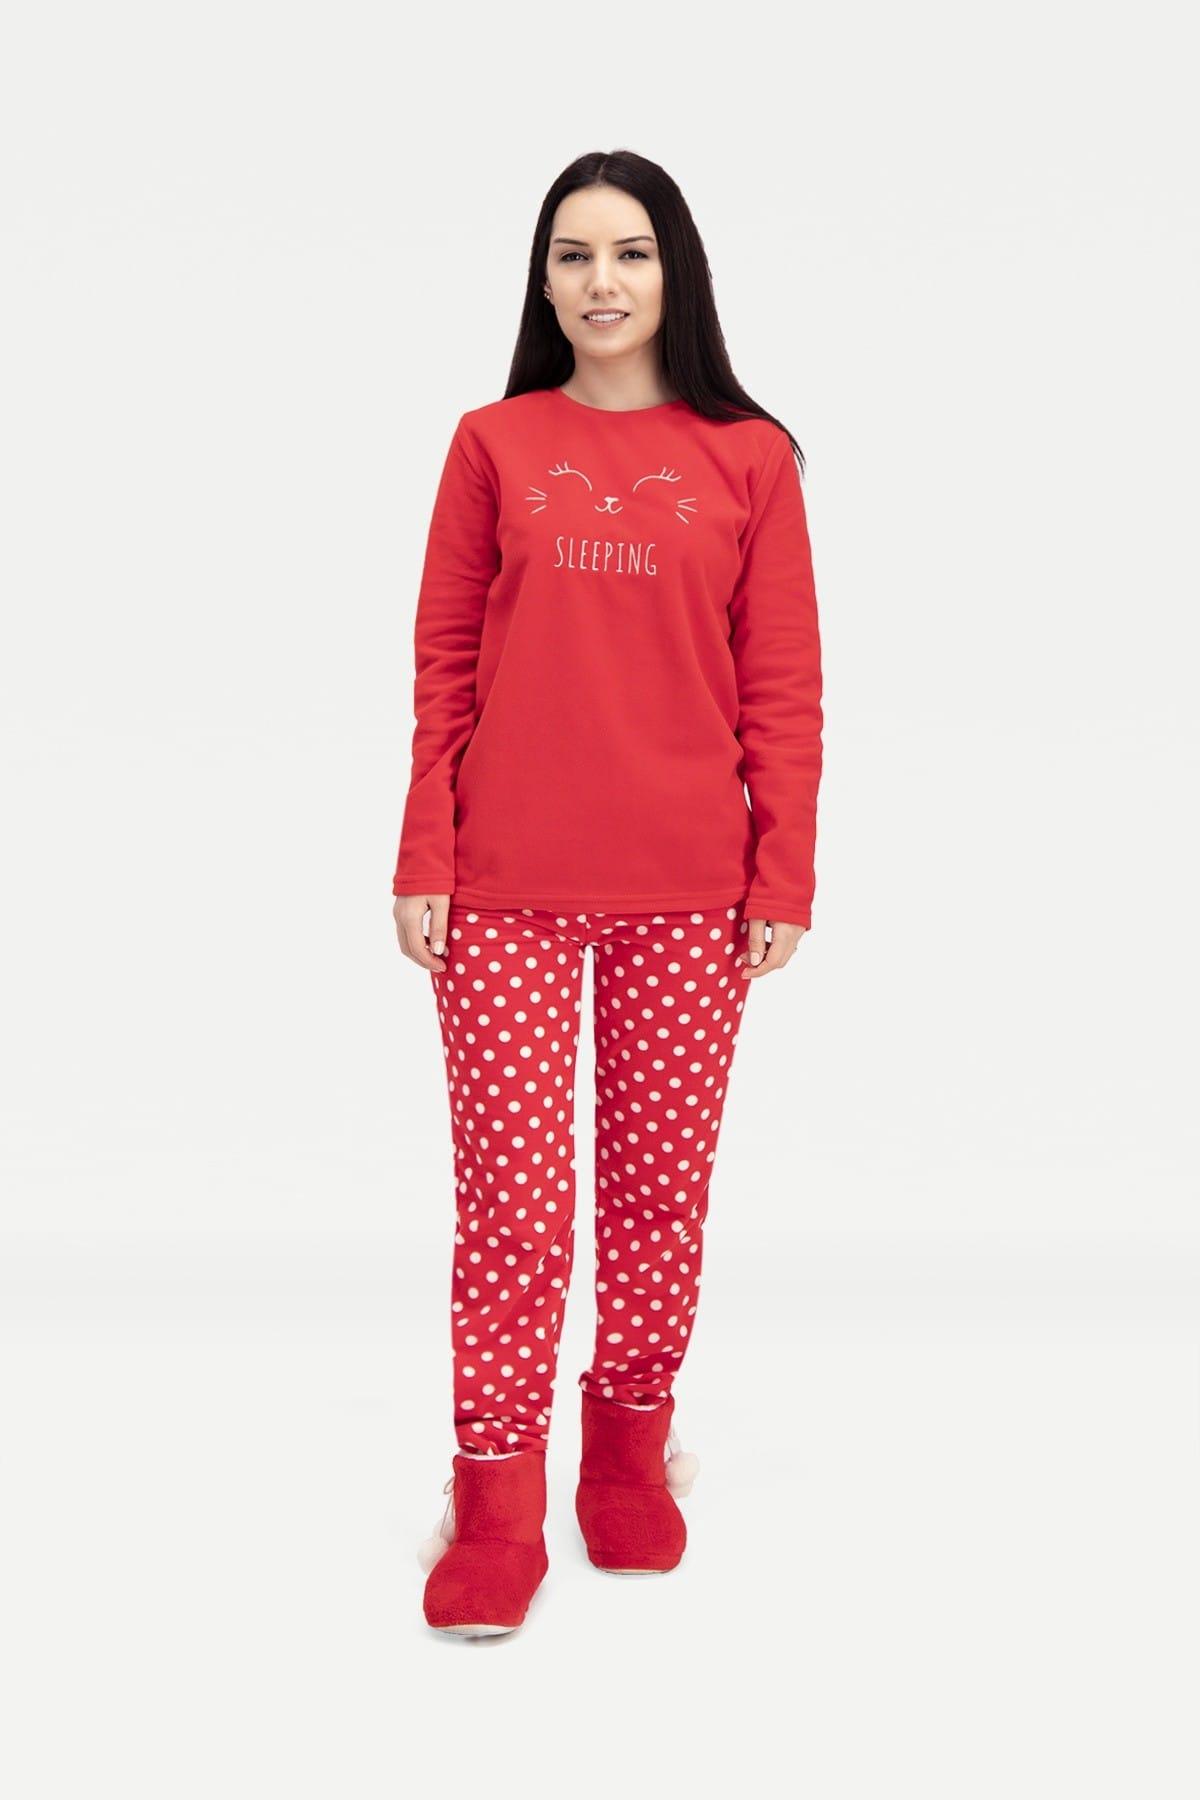 ROLY POLY Sleeping Bunny Polar Kadın Pijama Takımı Kırmızı 1